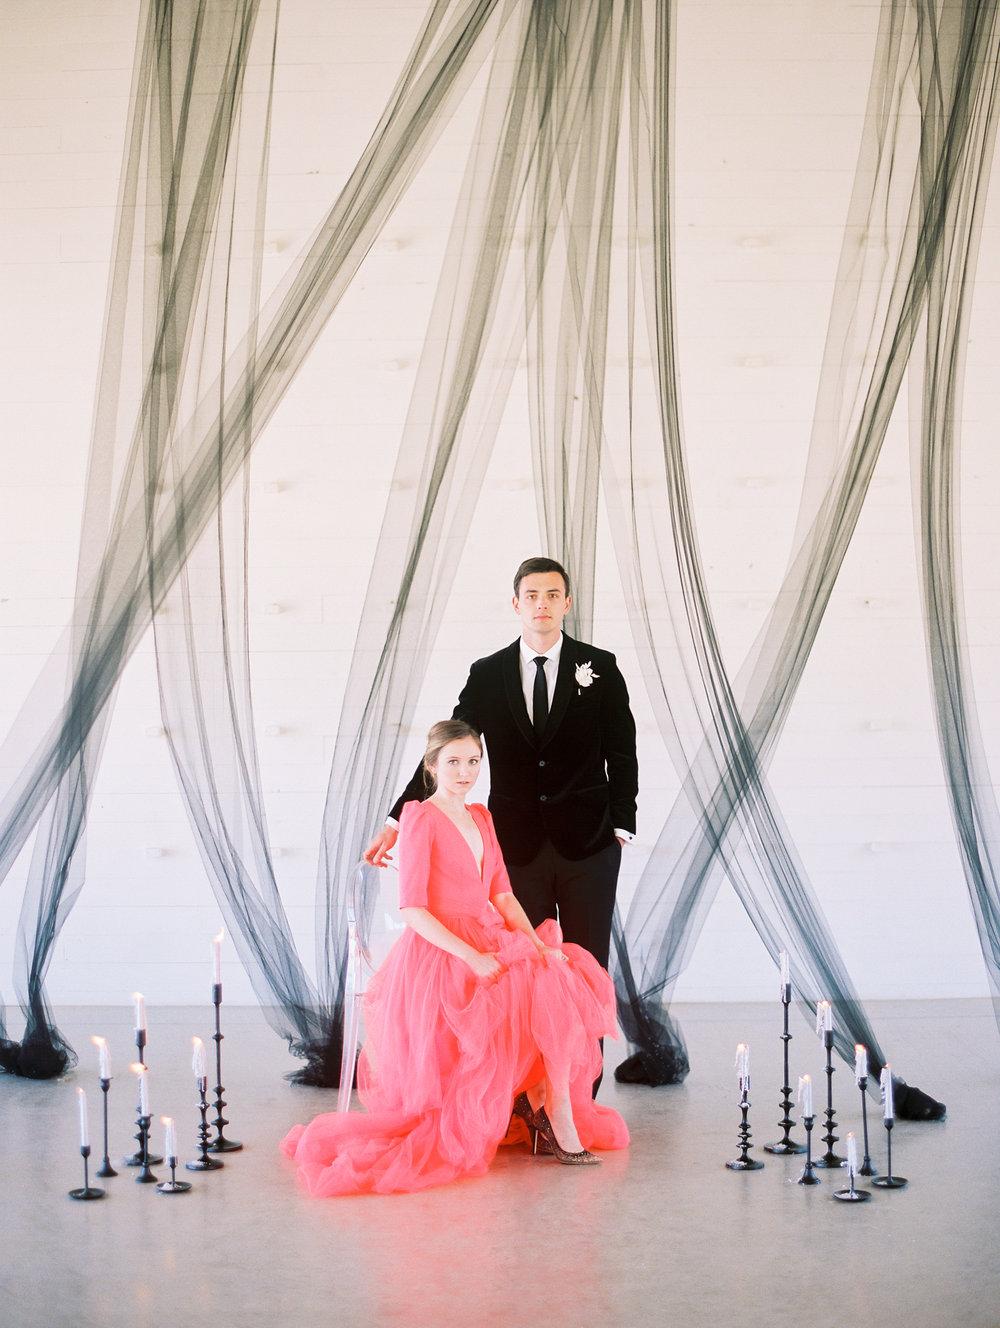 Kristin-La-Voie-Photography-Austin-Wedding-Photographer-Prospect-House-76.jpg